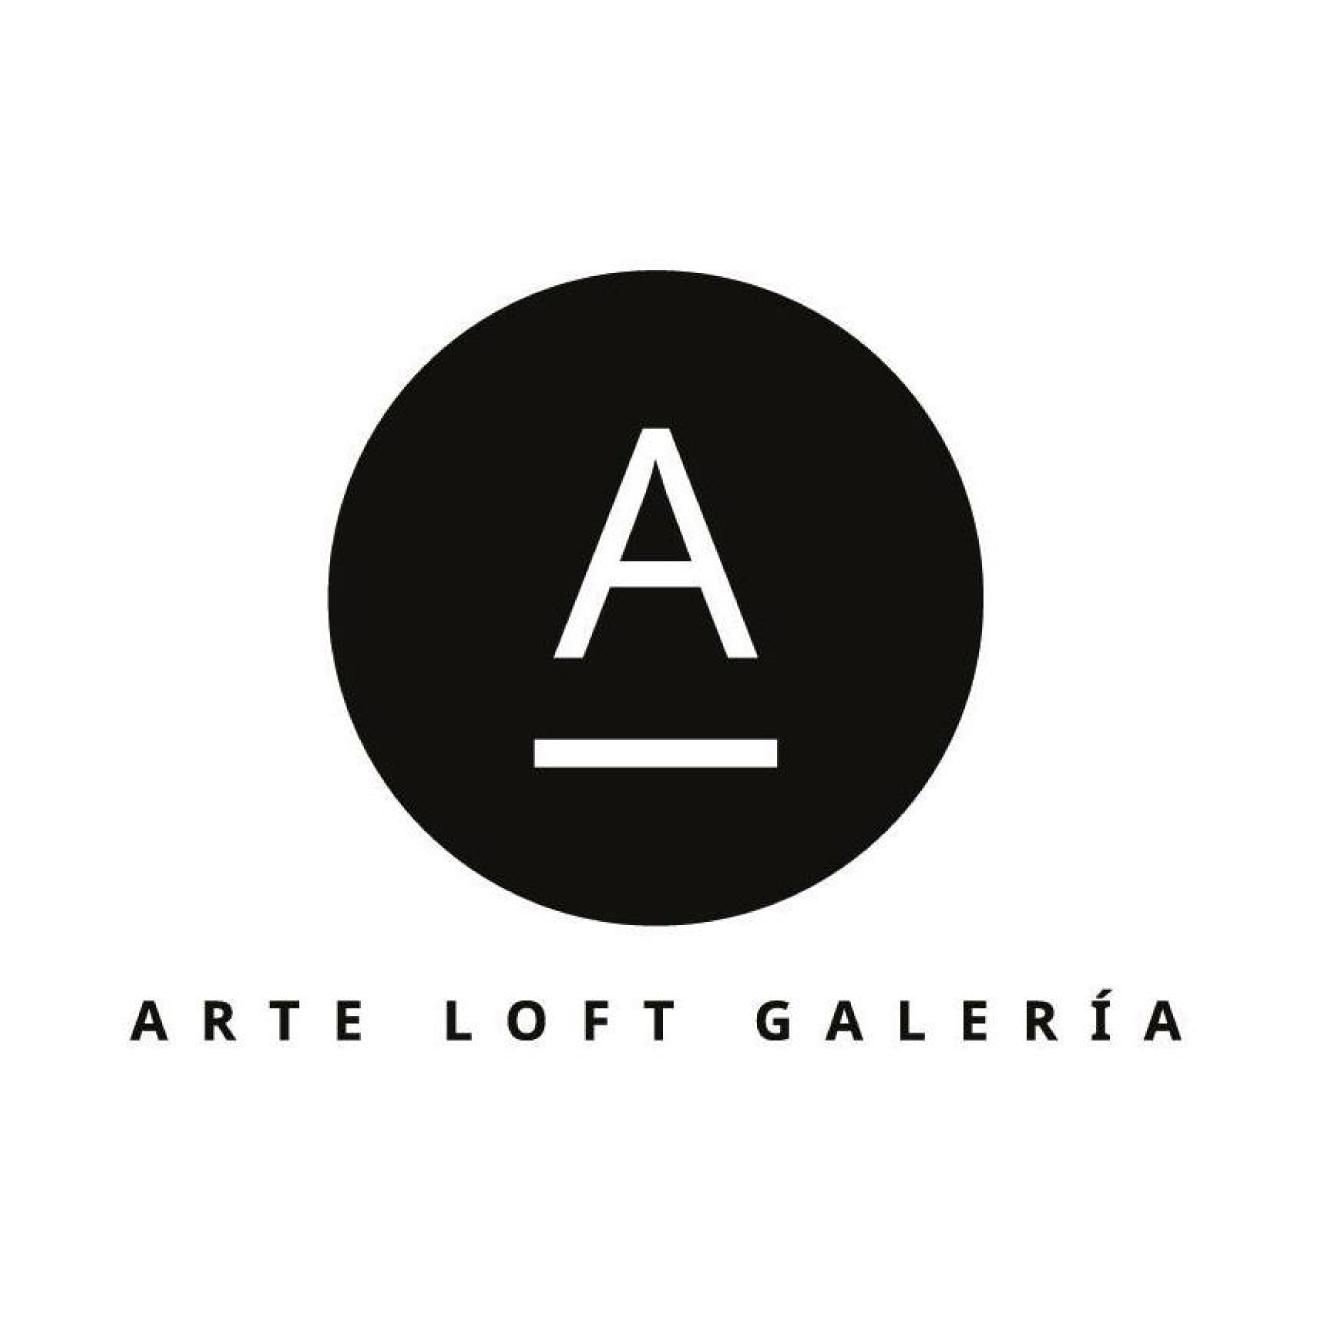 Arteloft Gallery